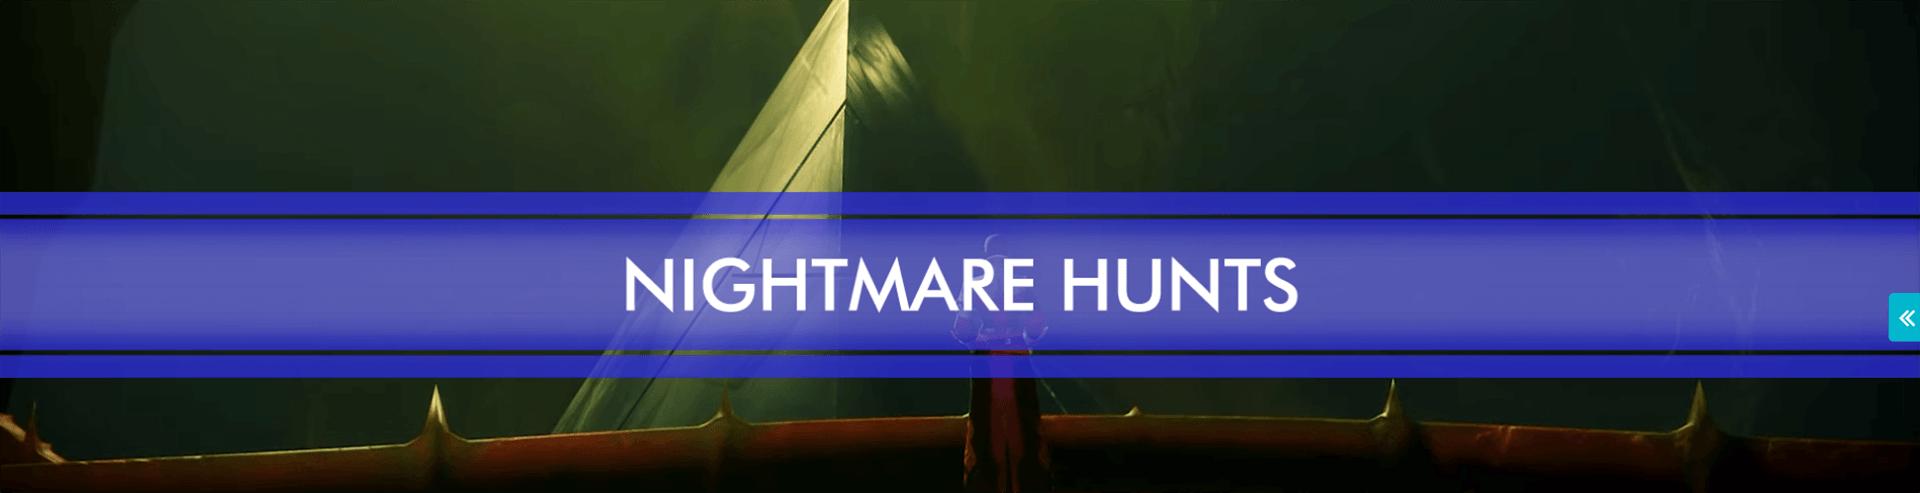 nightmare hunts img